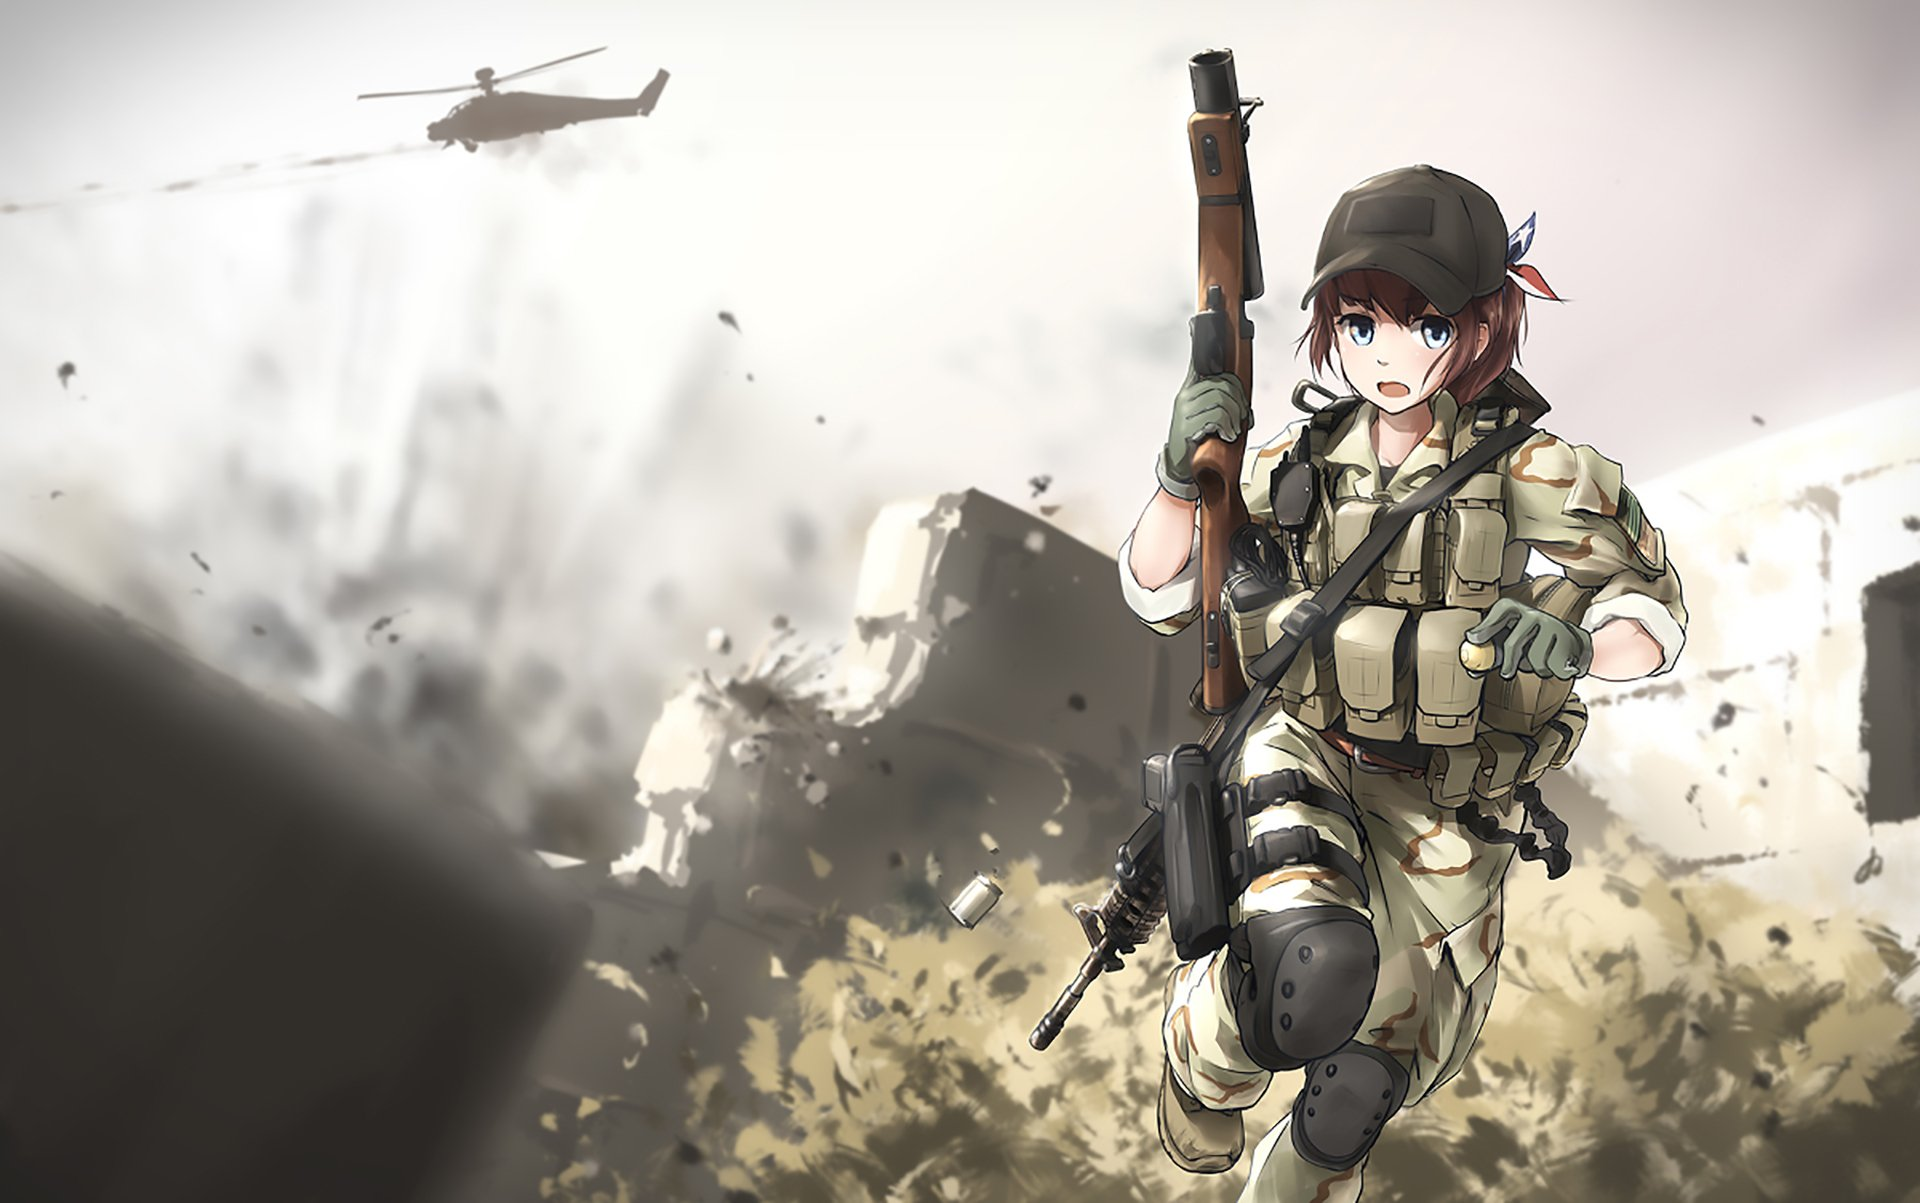 Original hd wallpaper background image 1920x1203 id - Anime war wallpaper ...